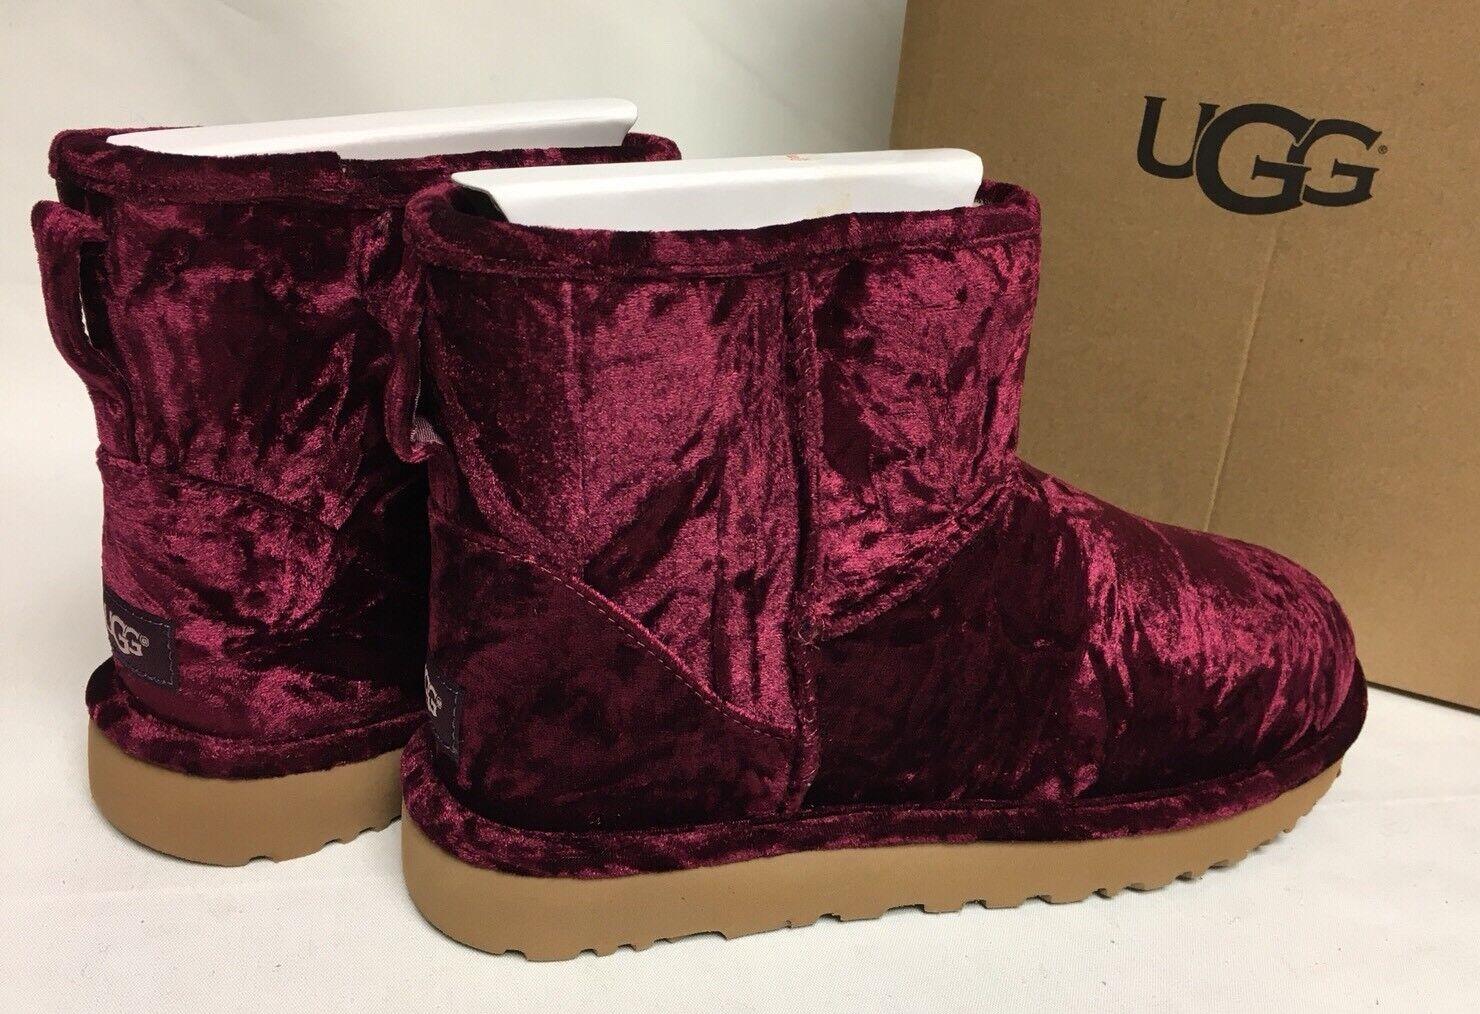 acabd1f6636 UGG Australia Crushed Velvet Classic Mini Boot Fig 1090871 Women's Sheepskin